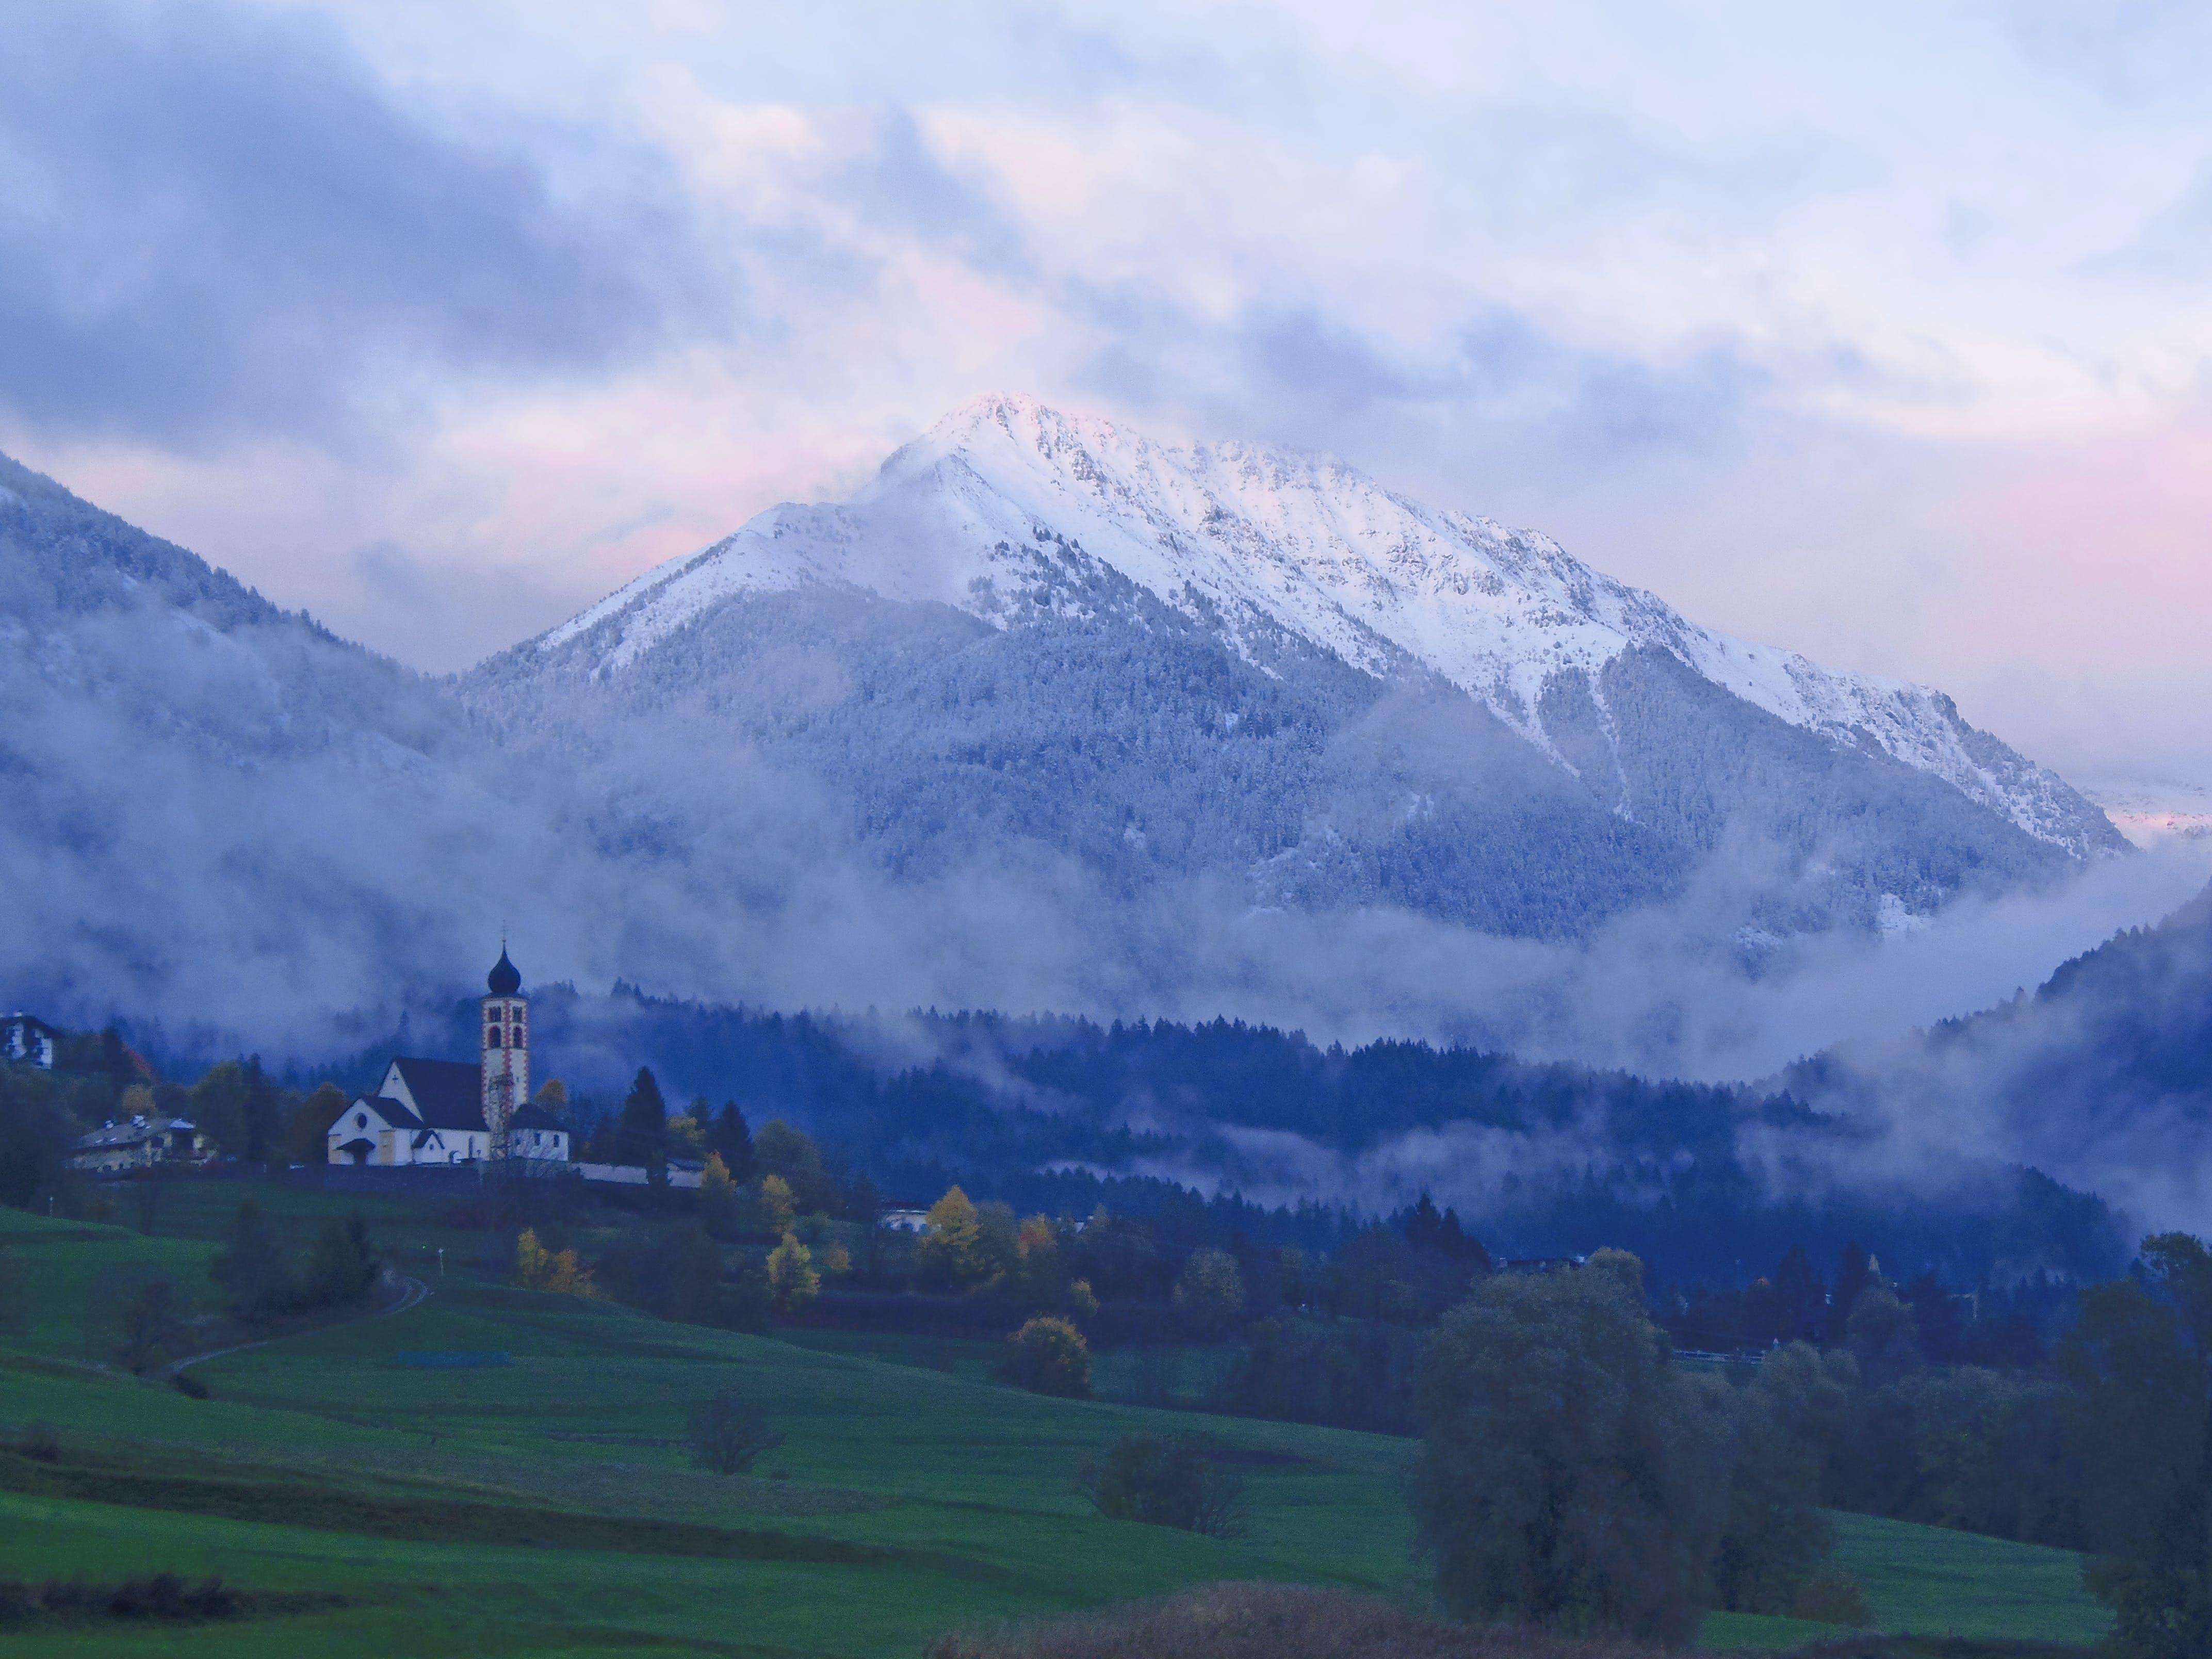 Free stock photo of church, cloud, Daiano, dolomiti